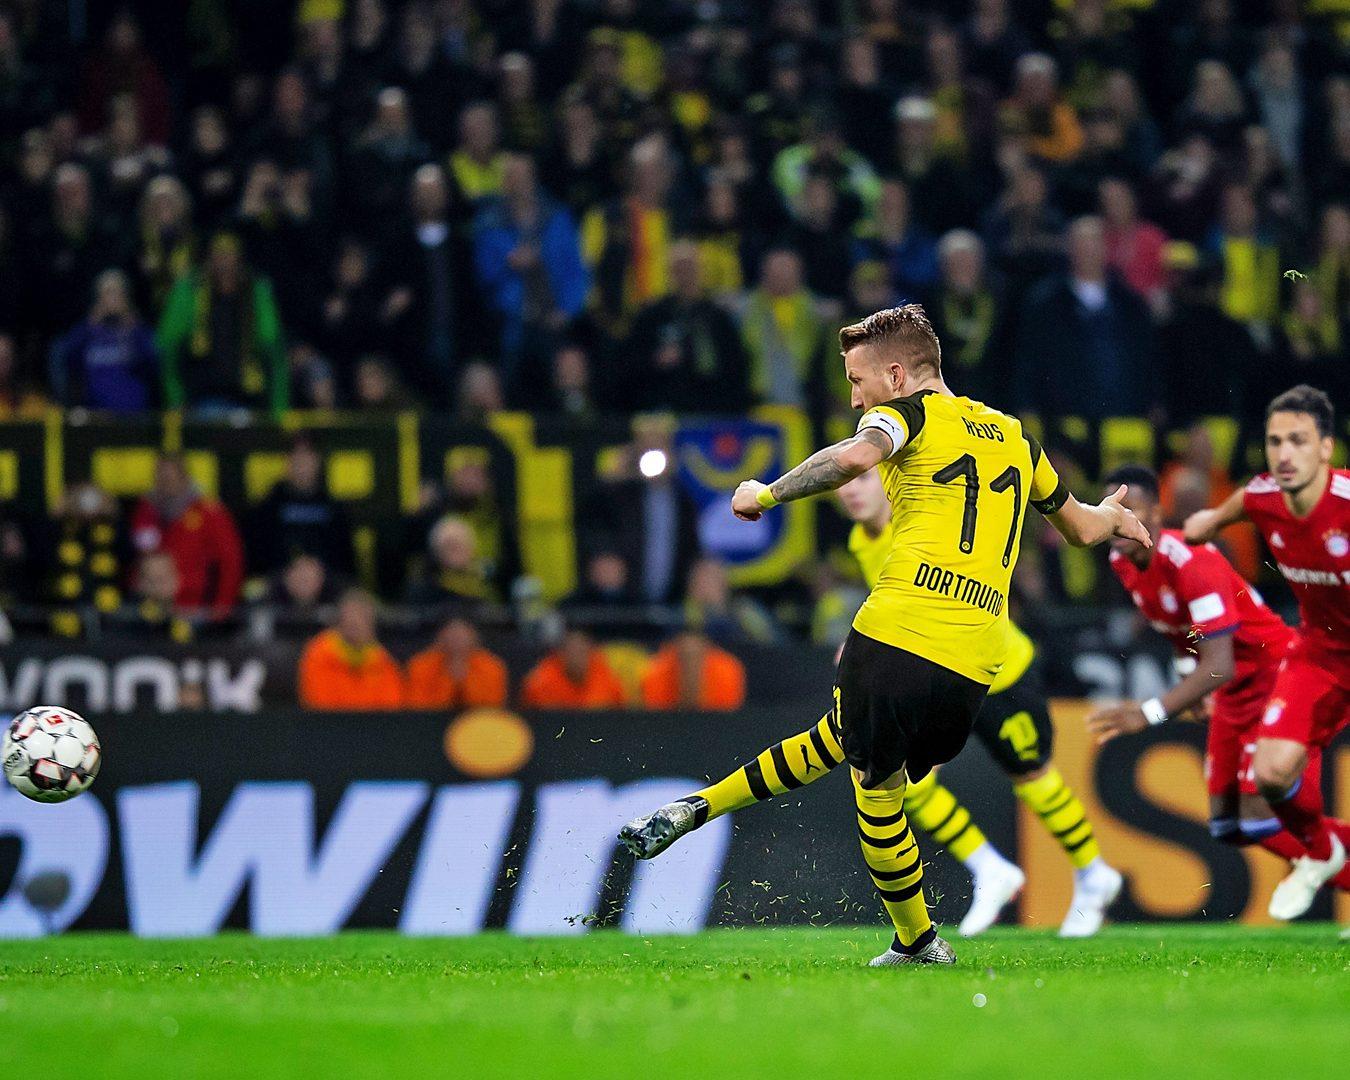 Bundesliga Bayern Munich Vs Borussia Dortmund The Top 5 Matches In Der Klassiker History